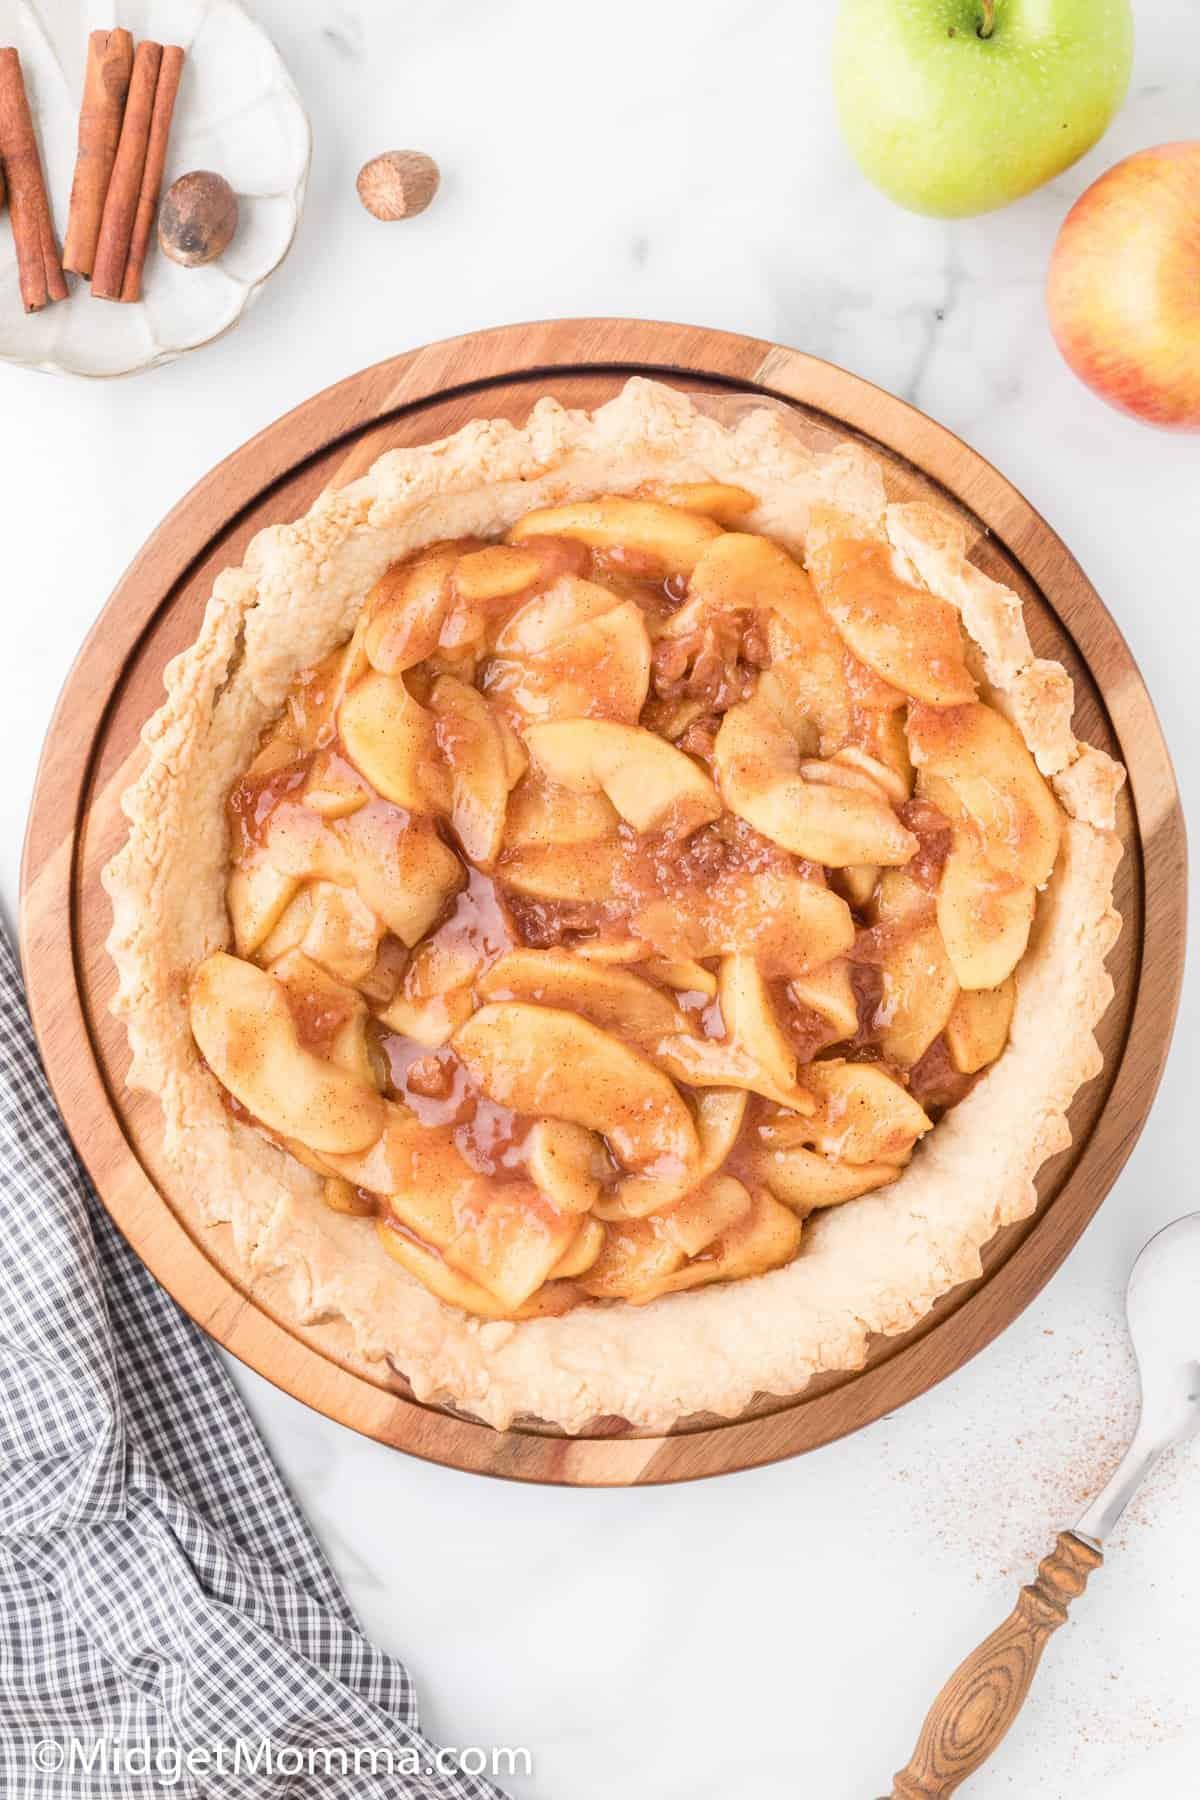 homemade apple pie filling in a pie crust